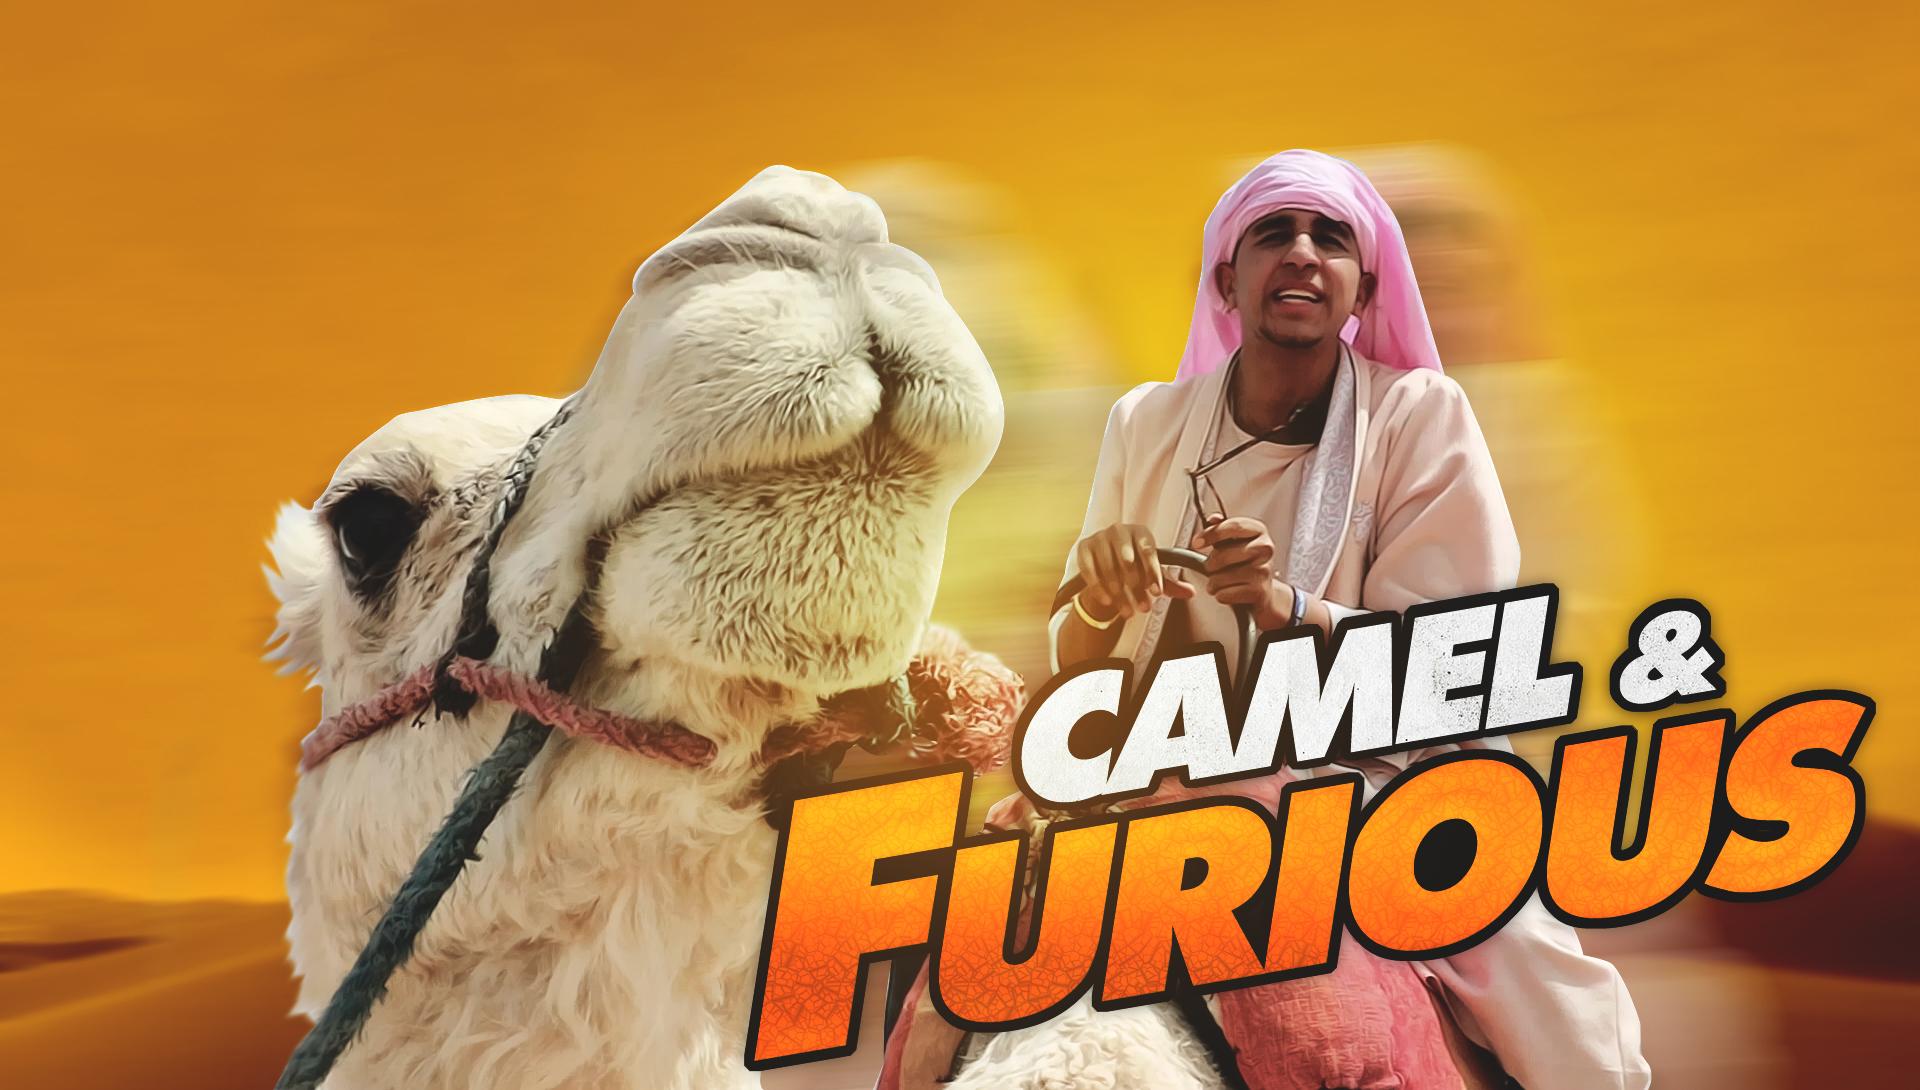 Temporada 2 Camel & Furious